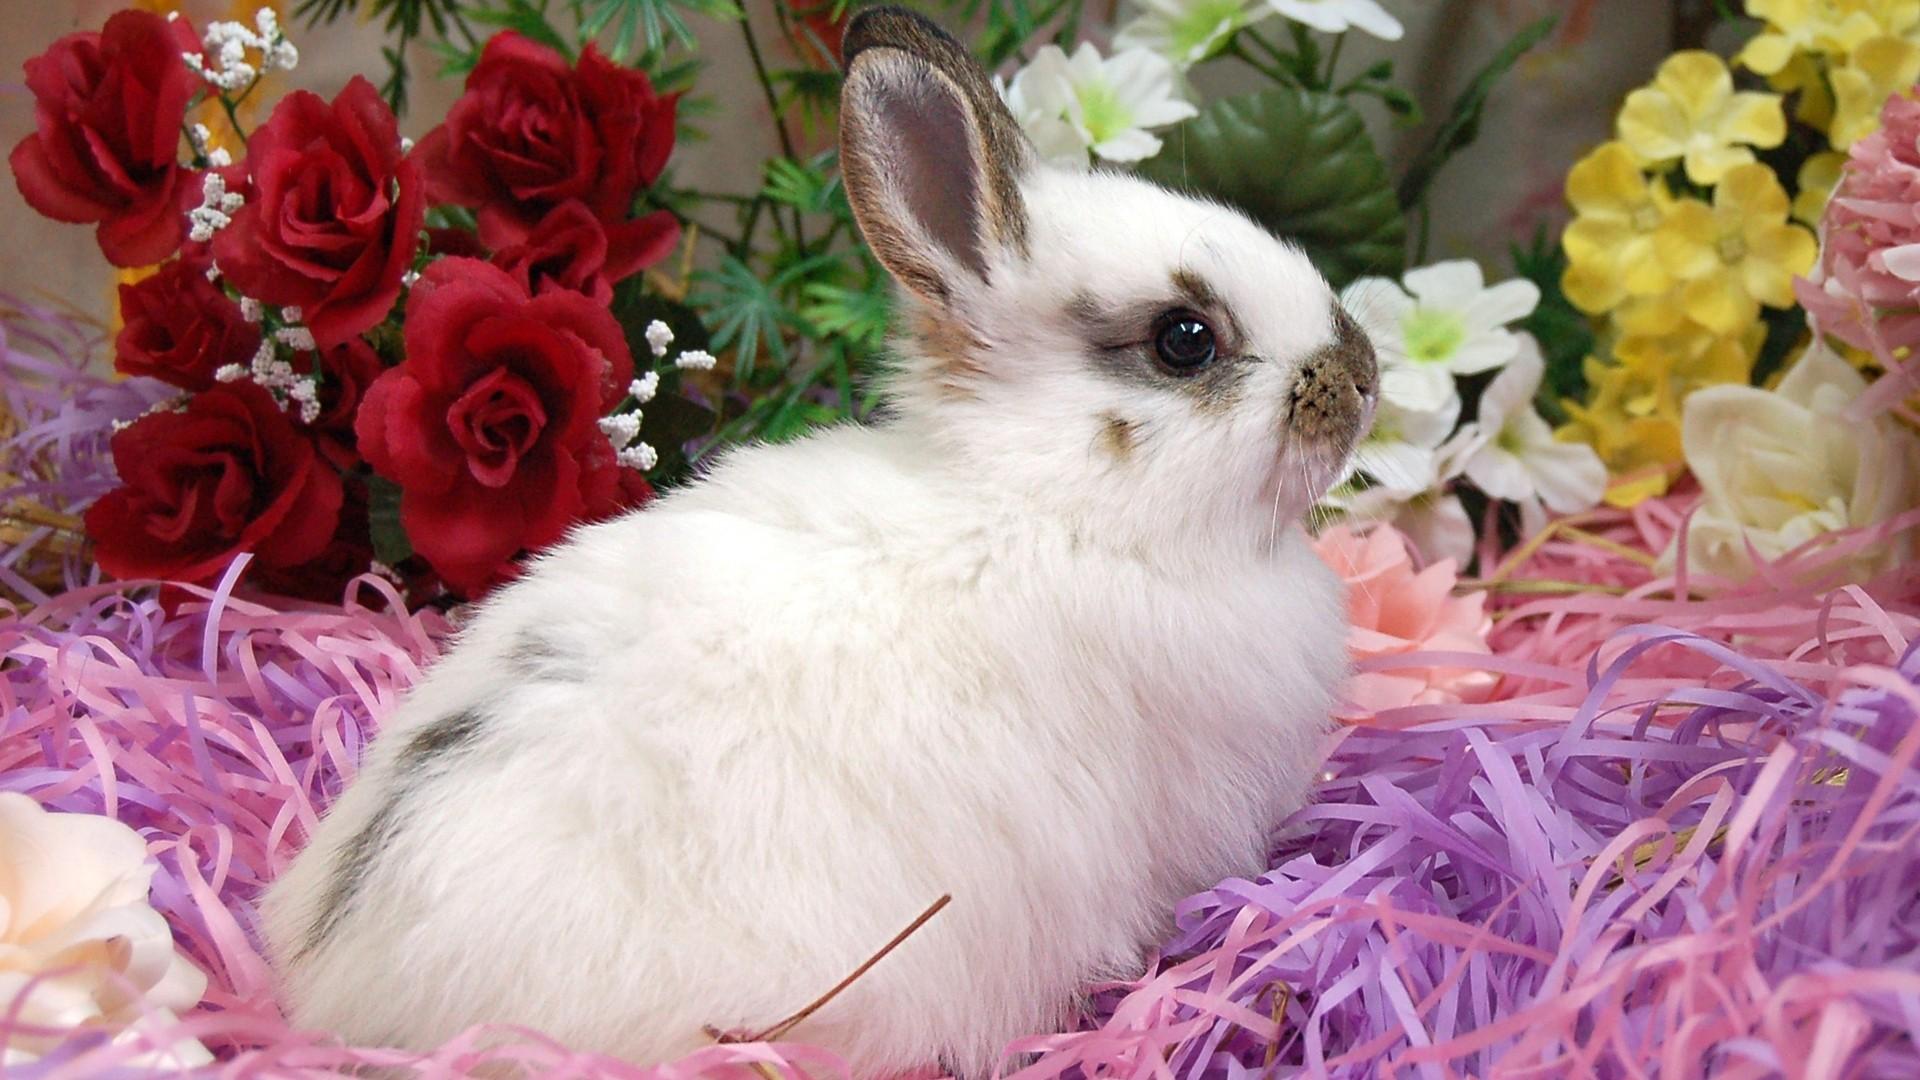 Bunny Background Wallpaper